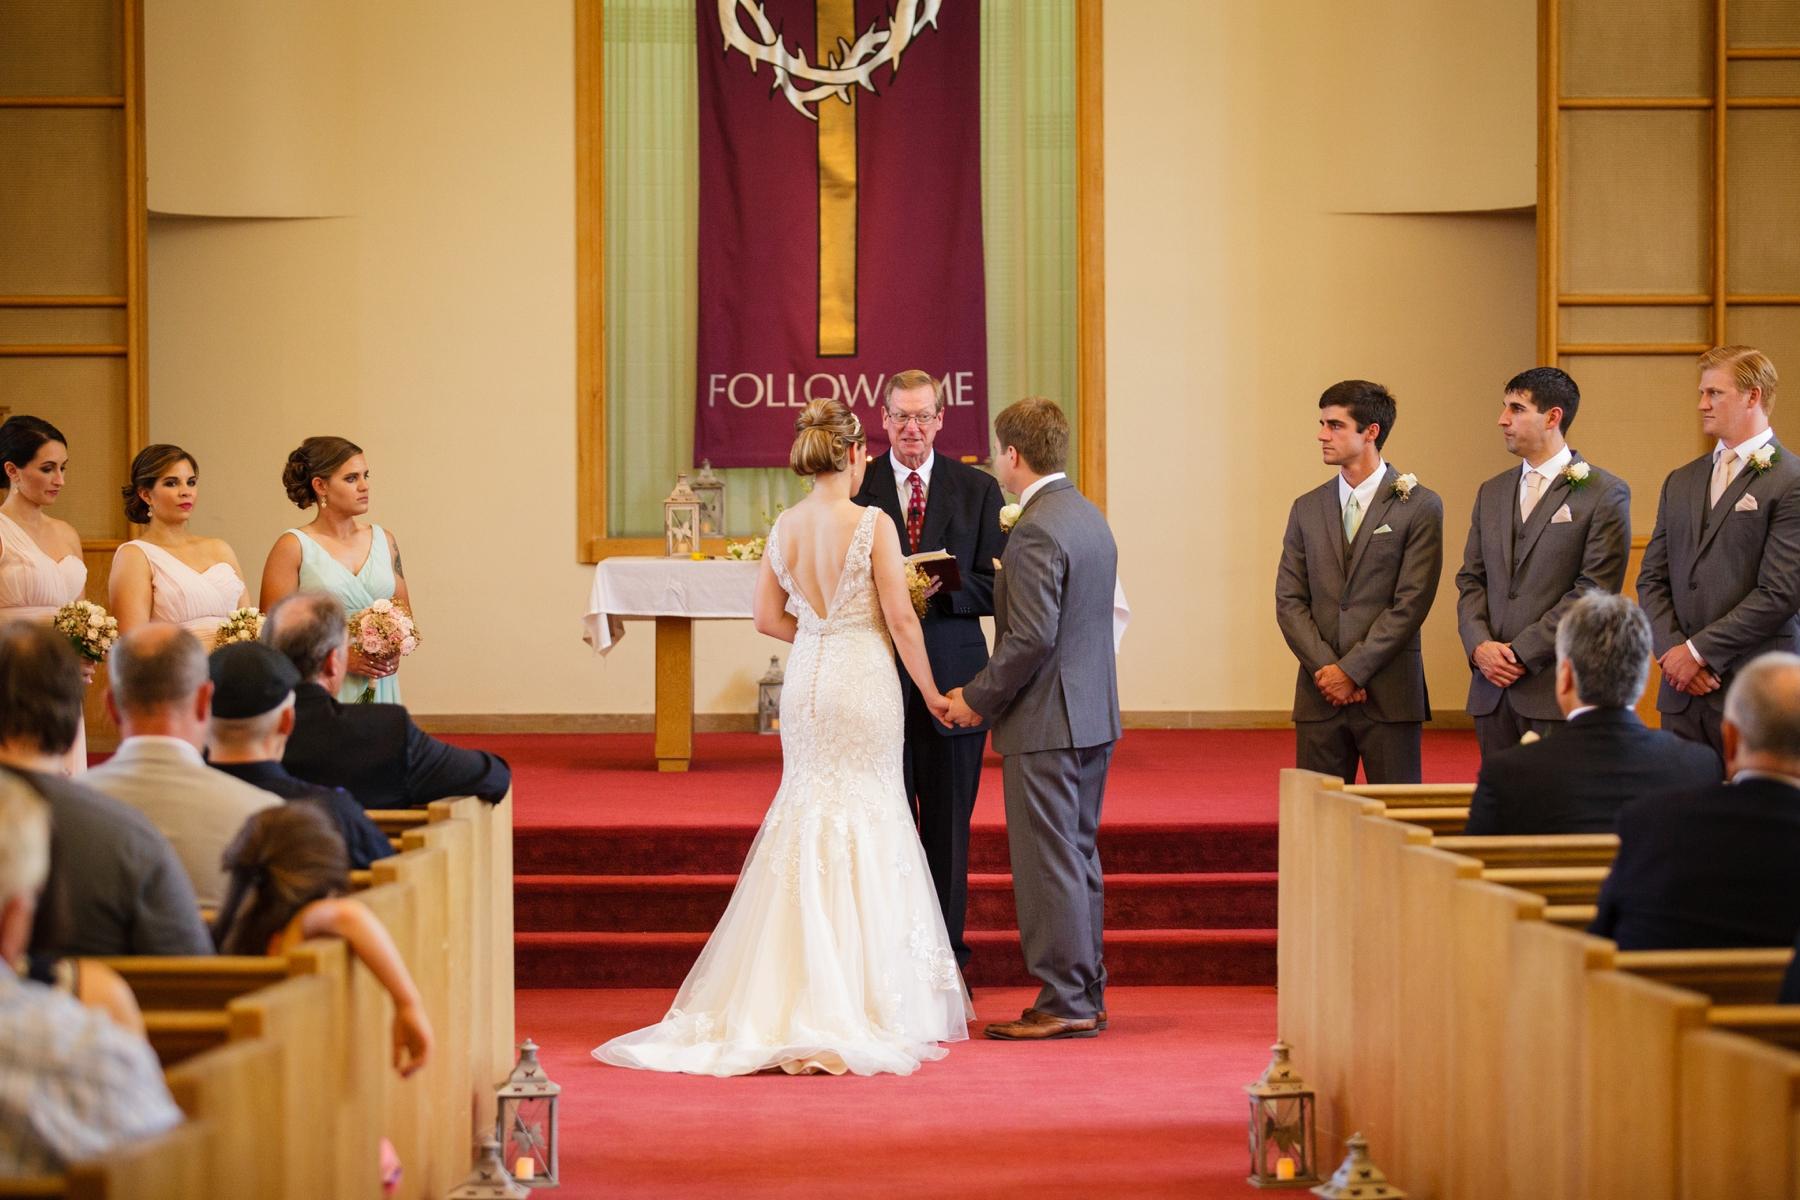 Ben_Jillian_Midland_Baycity_Wedding_0038.jpg